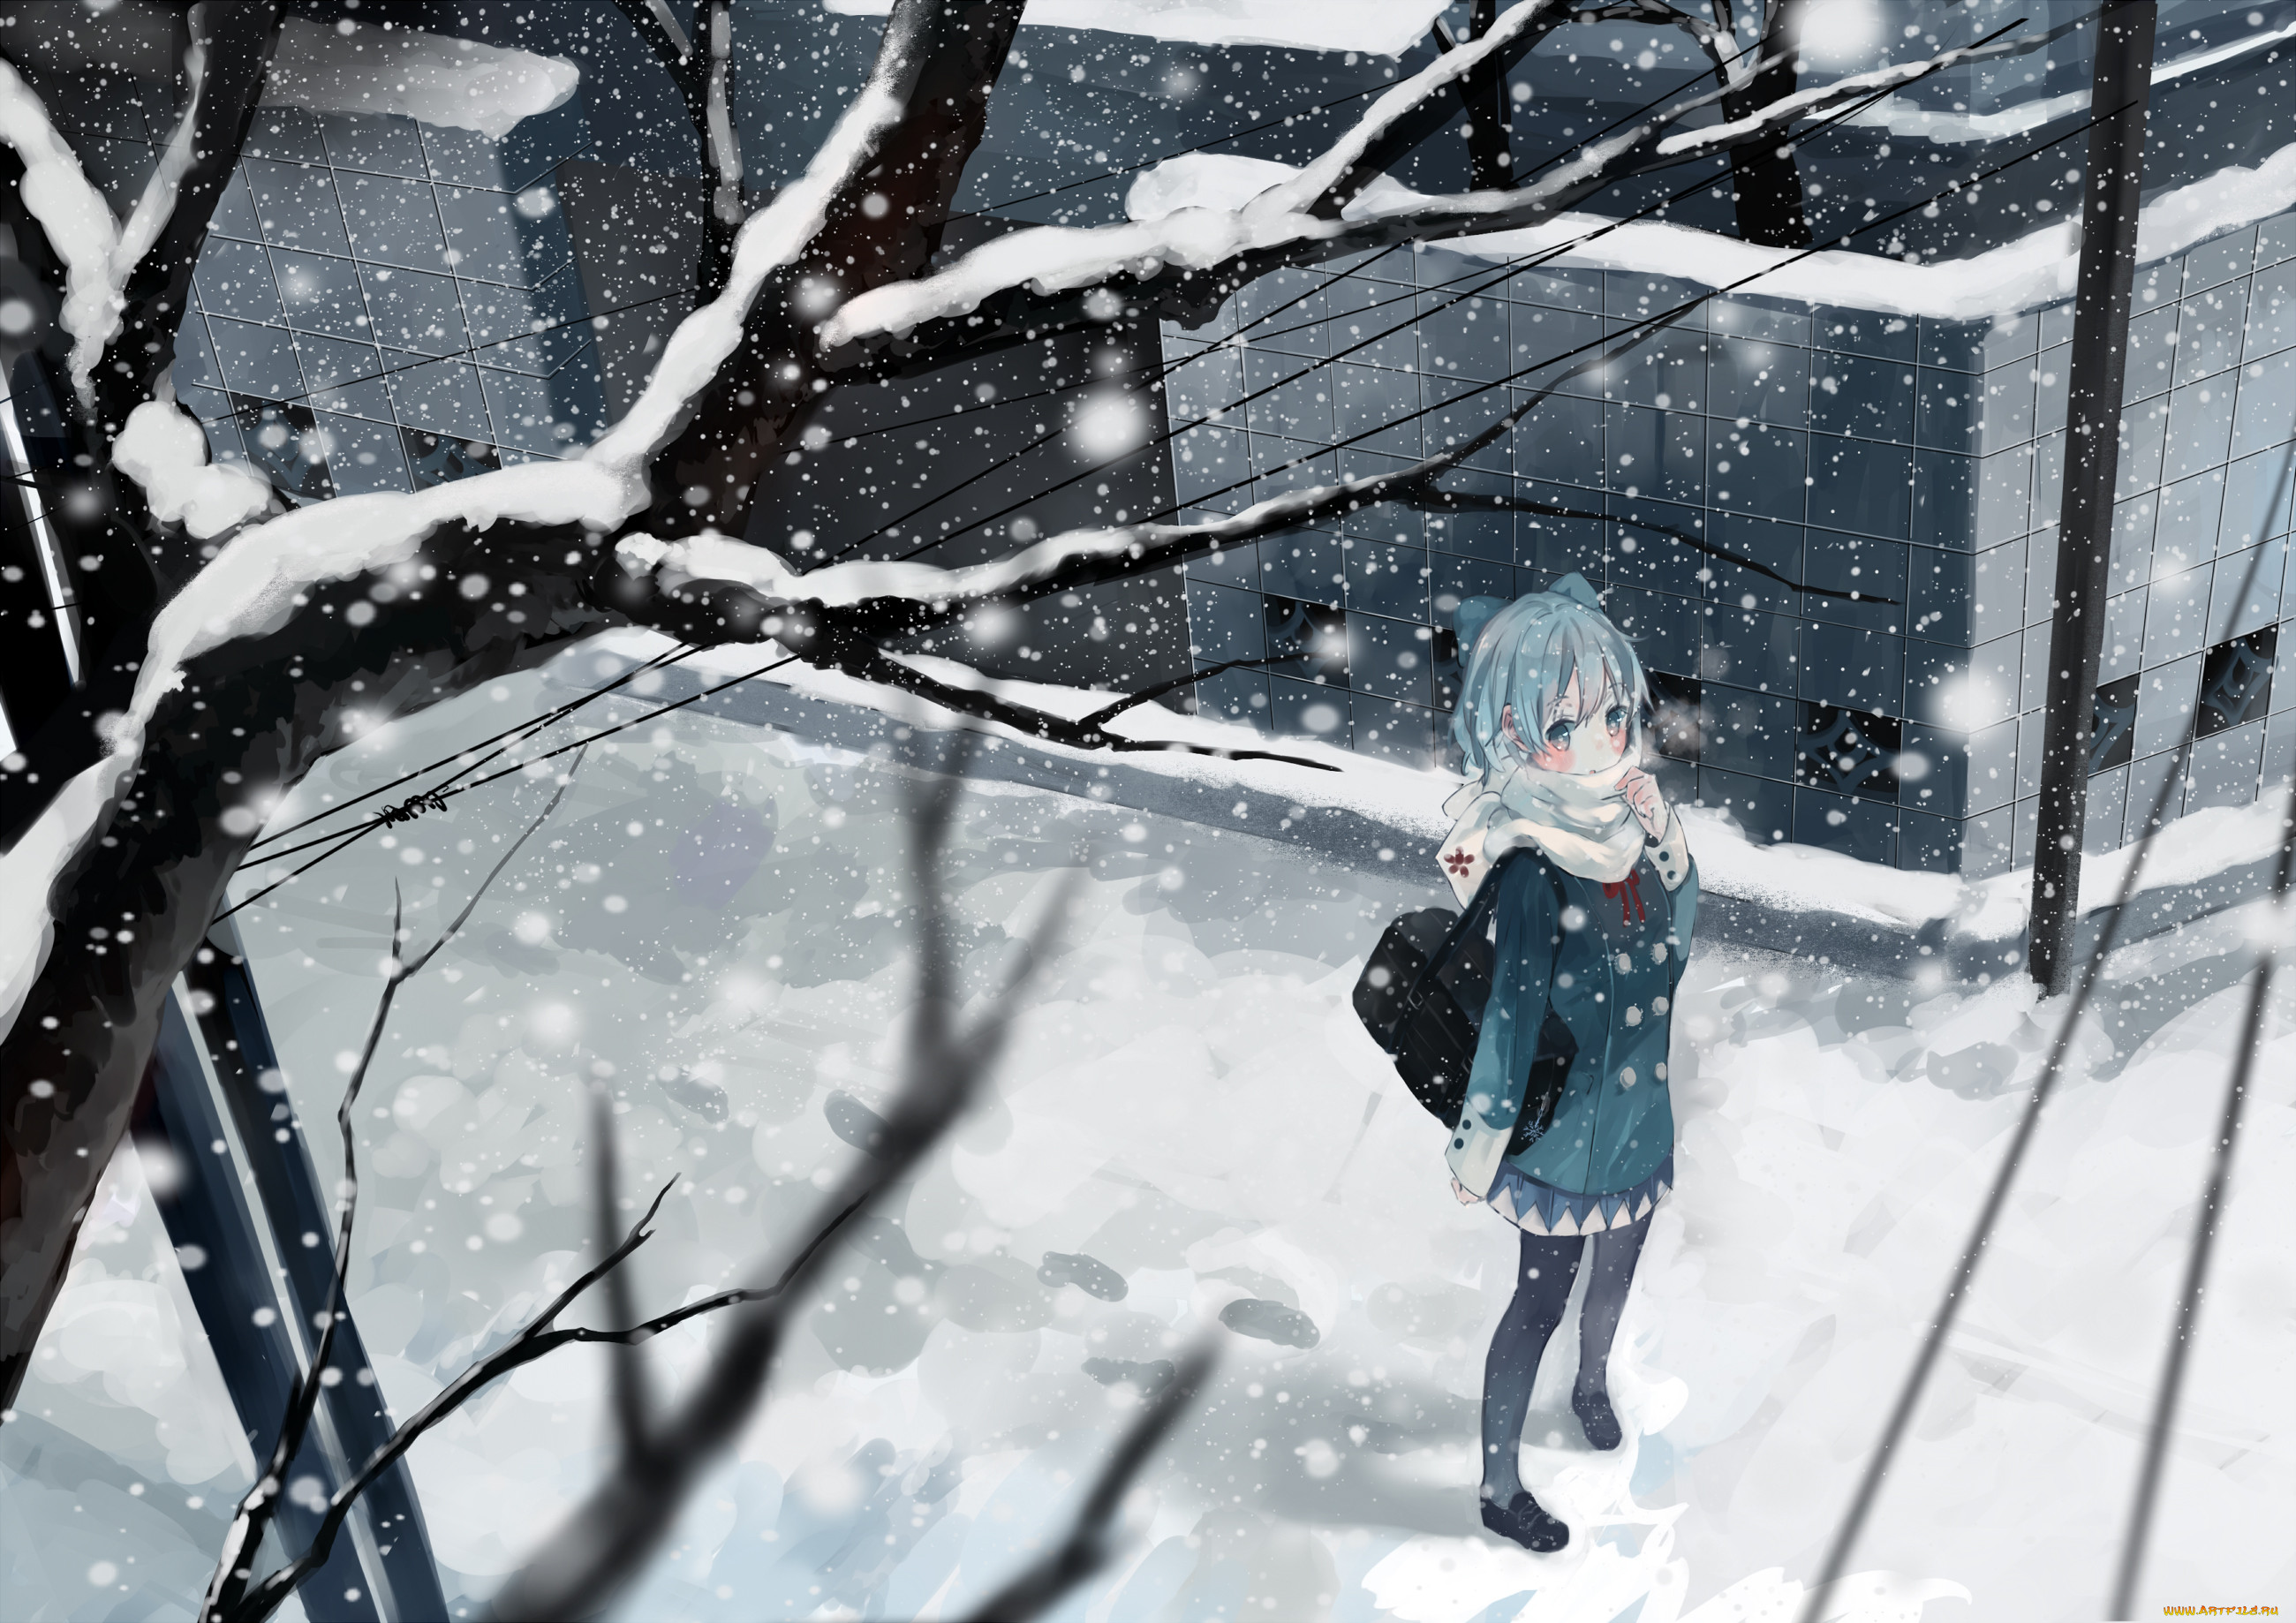 Арты зимних аниме картинок